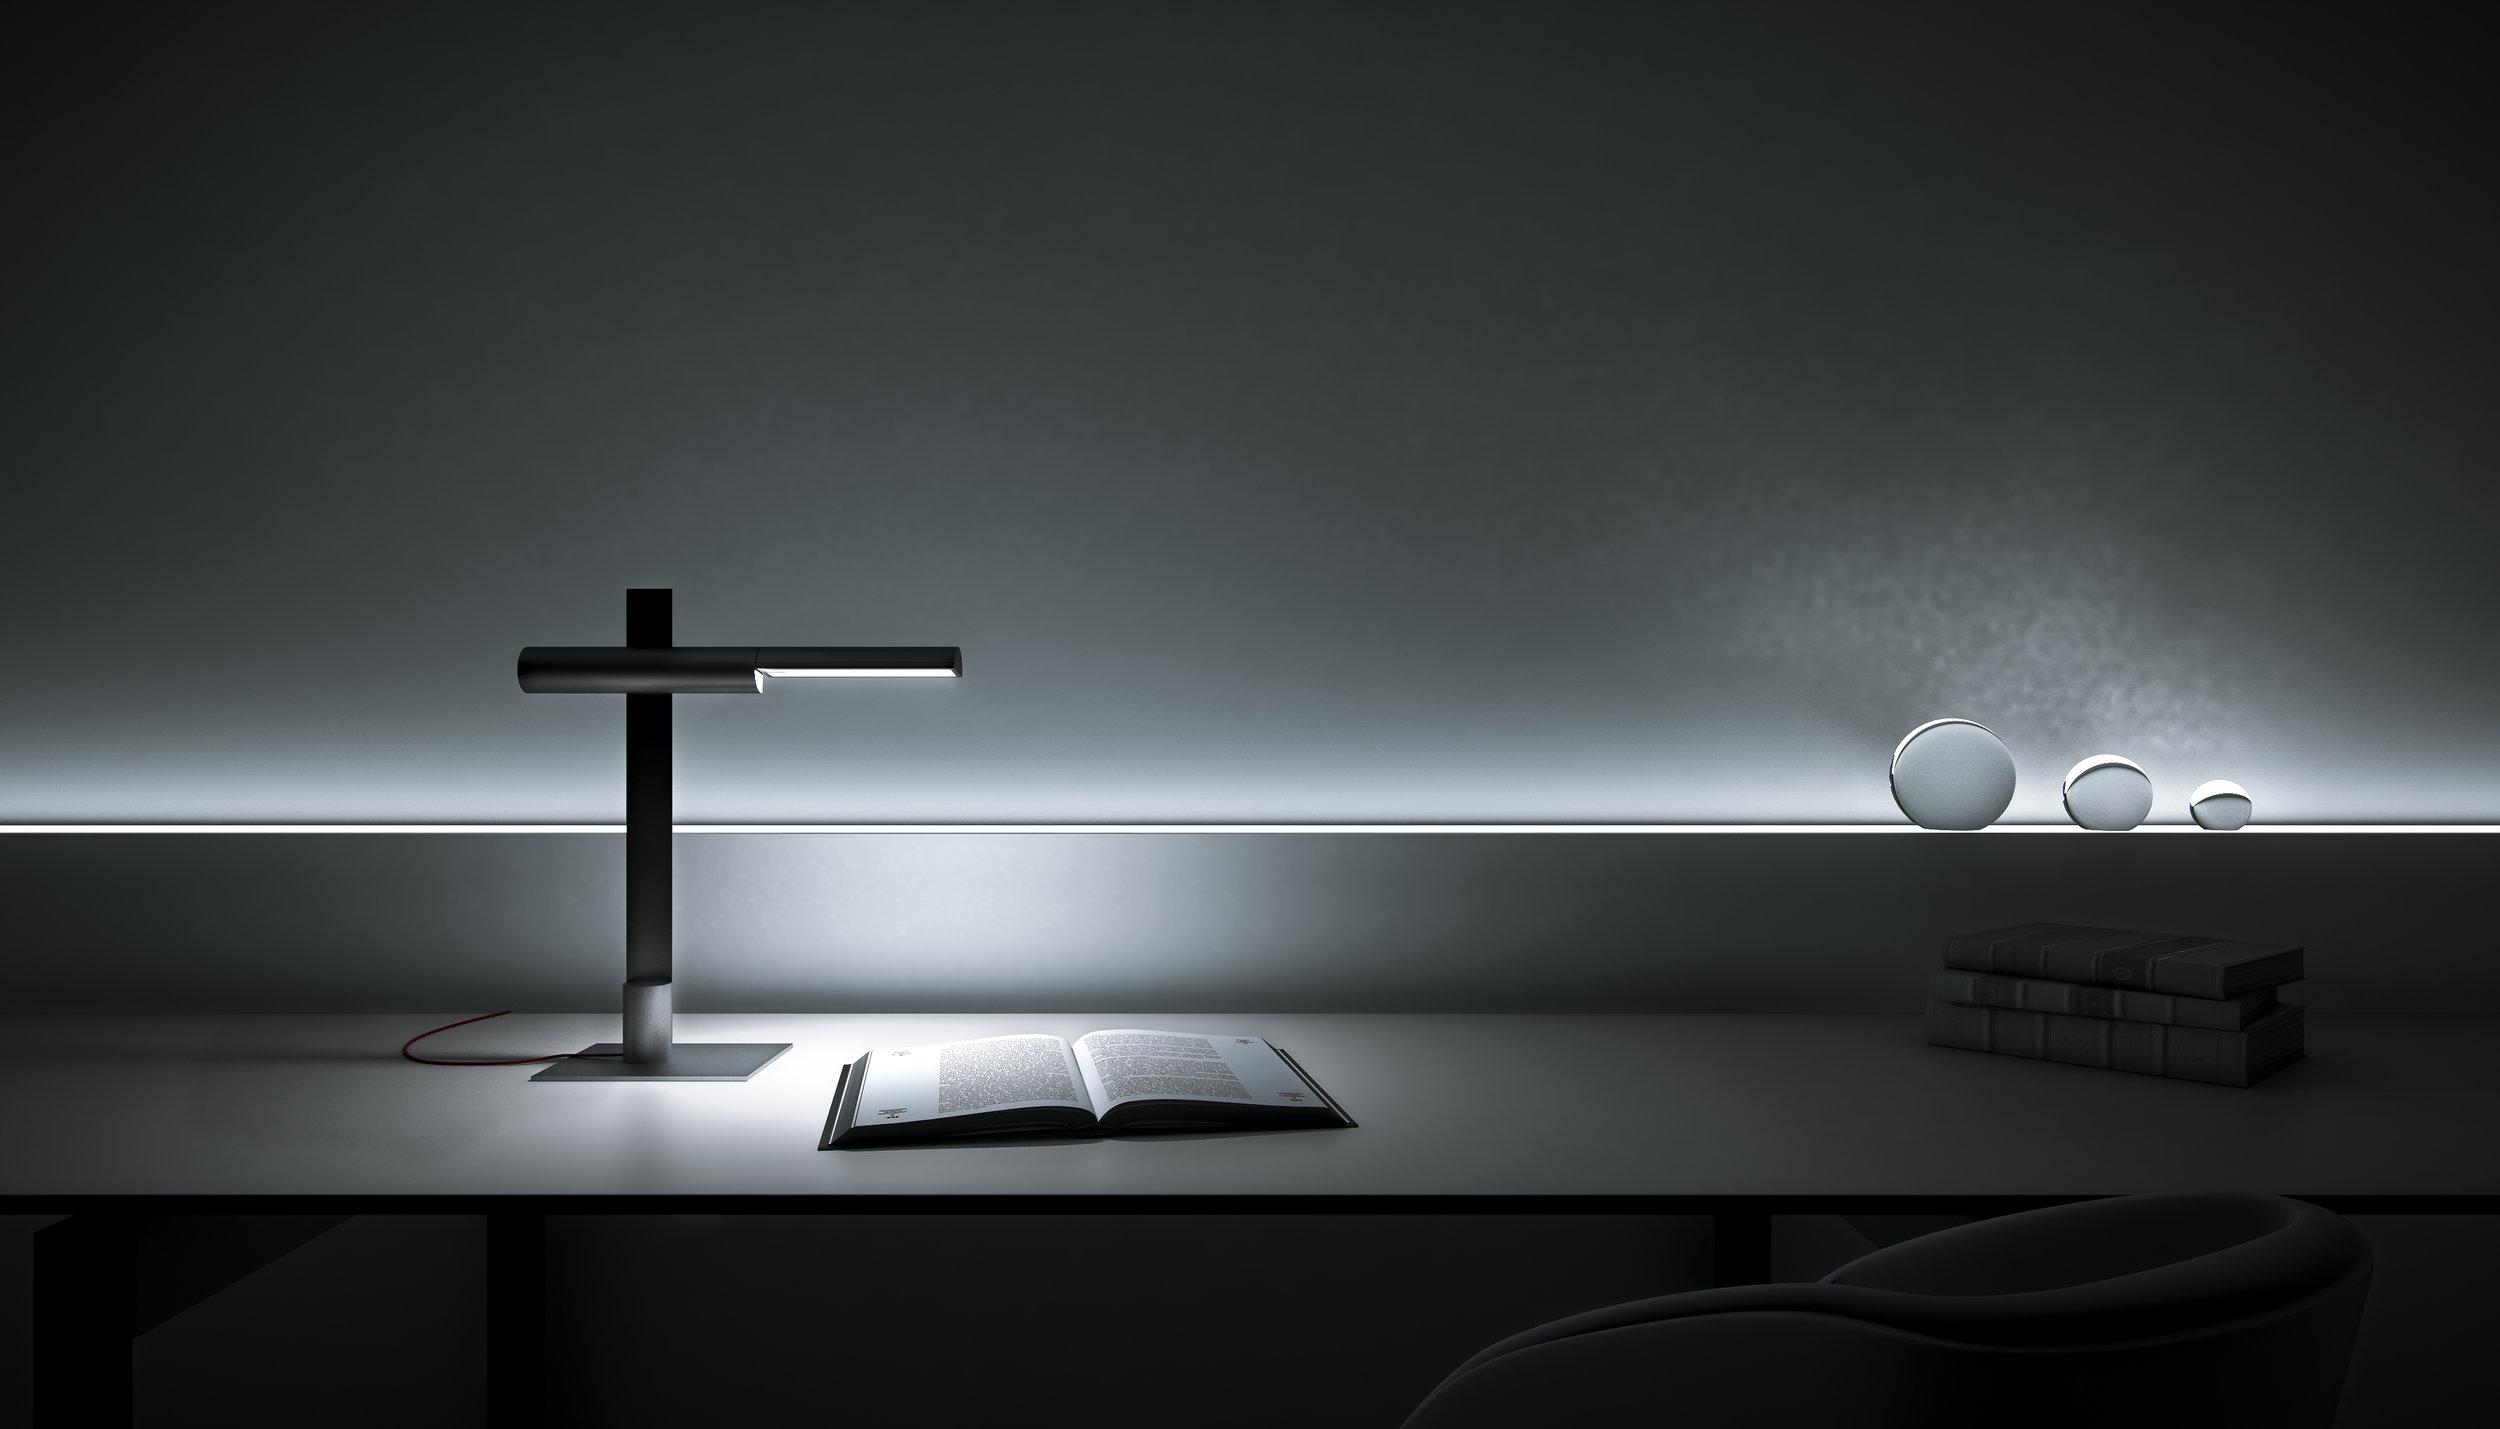 lamp on table.jpg